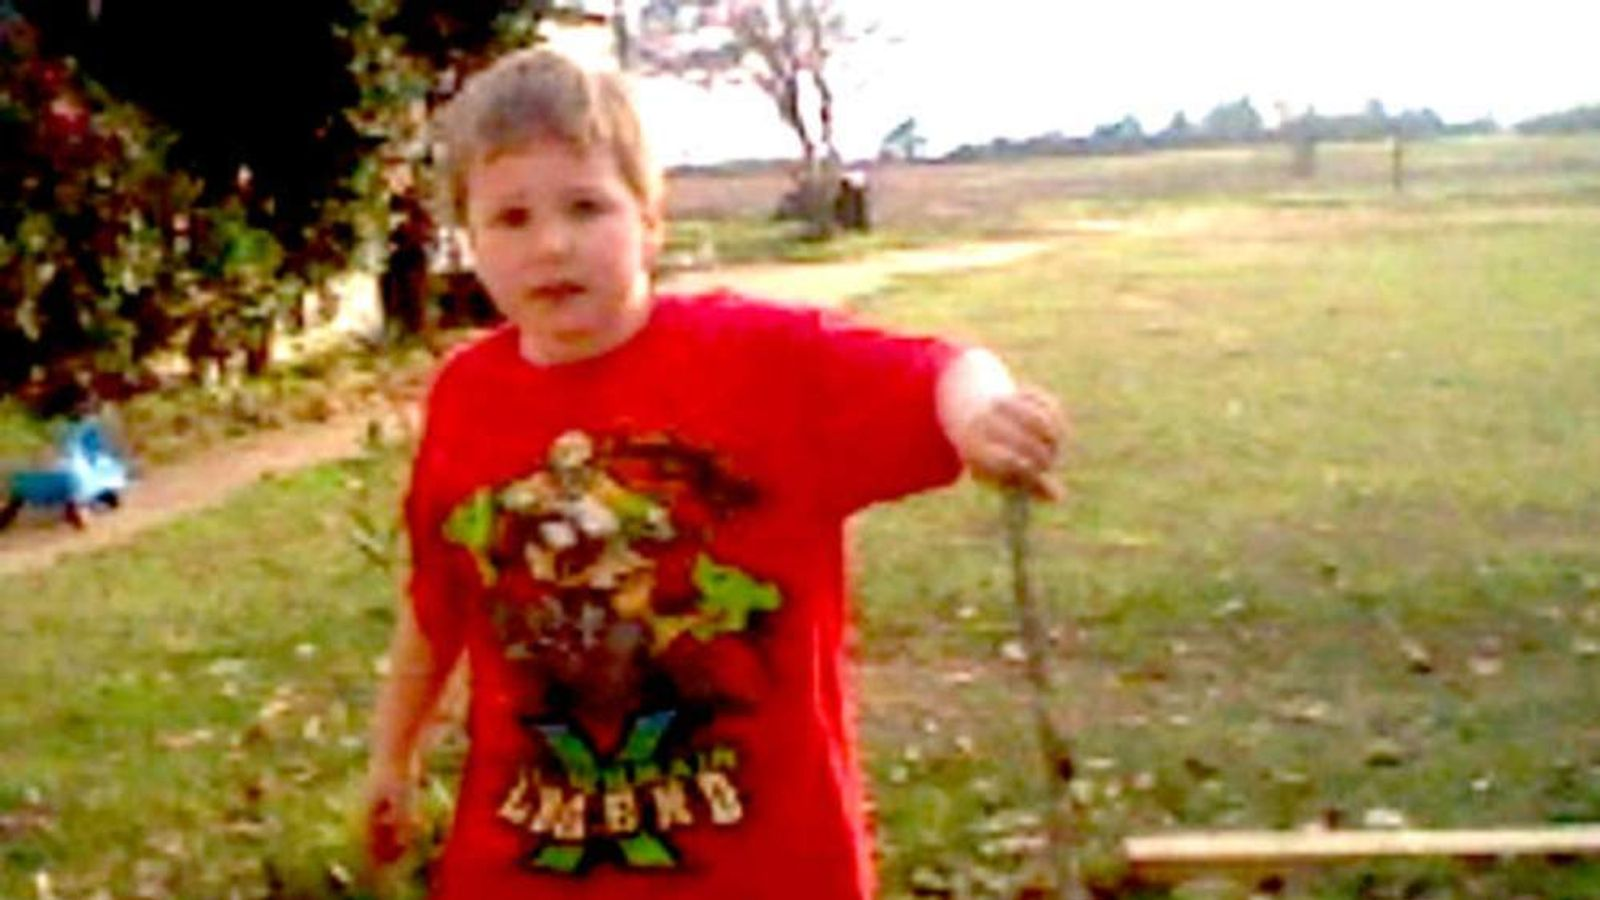 Alabama hostage Ethan